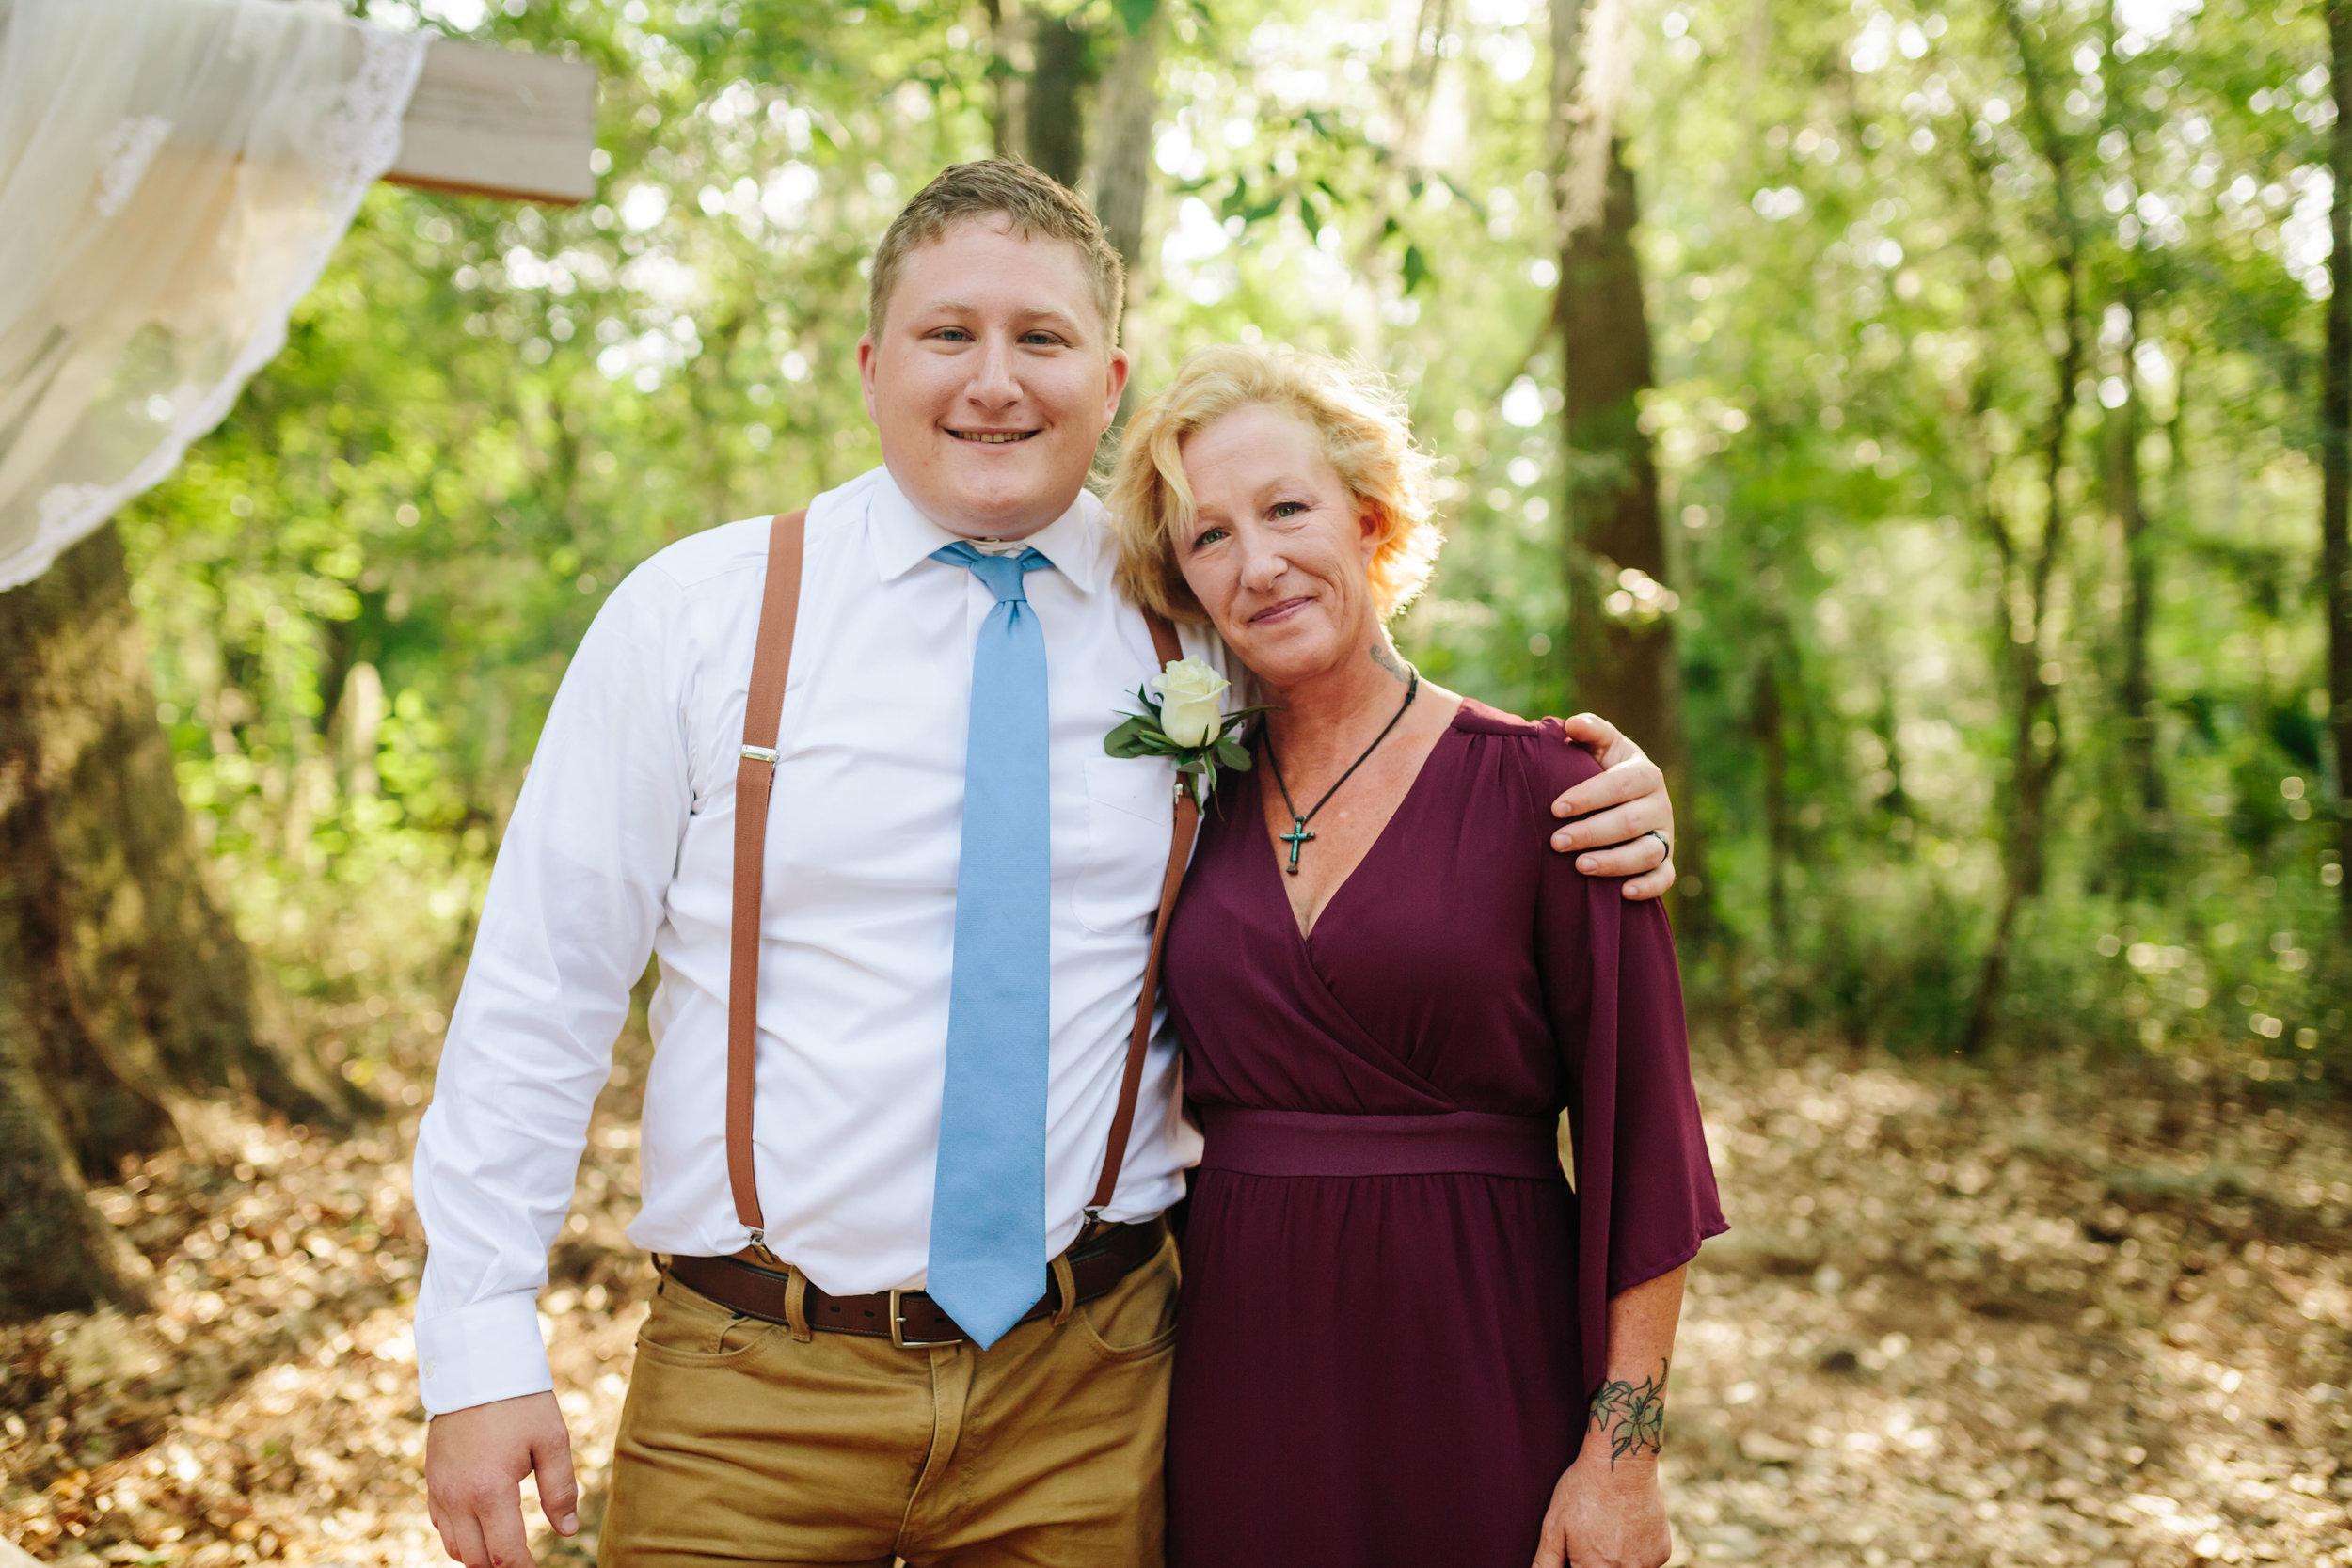 Griffin Wedding October Oaks Farm-380.jpg